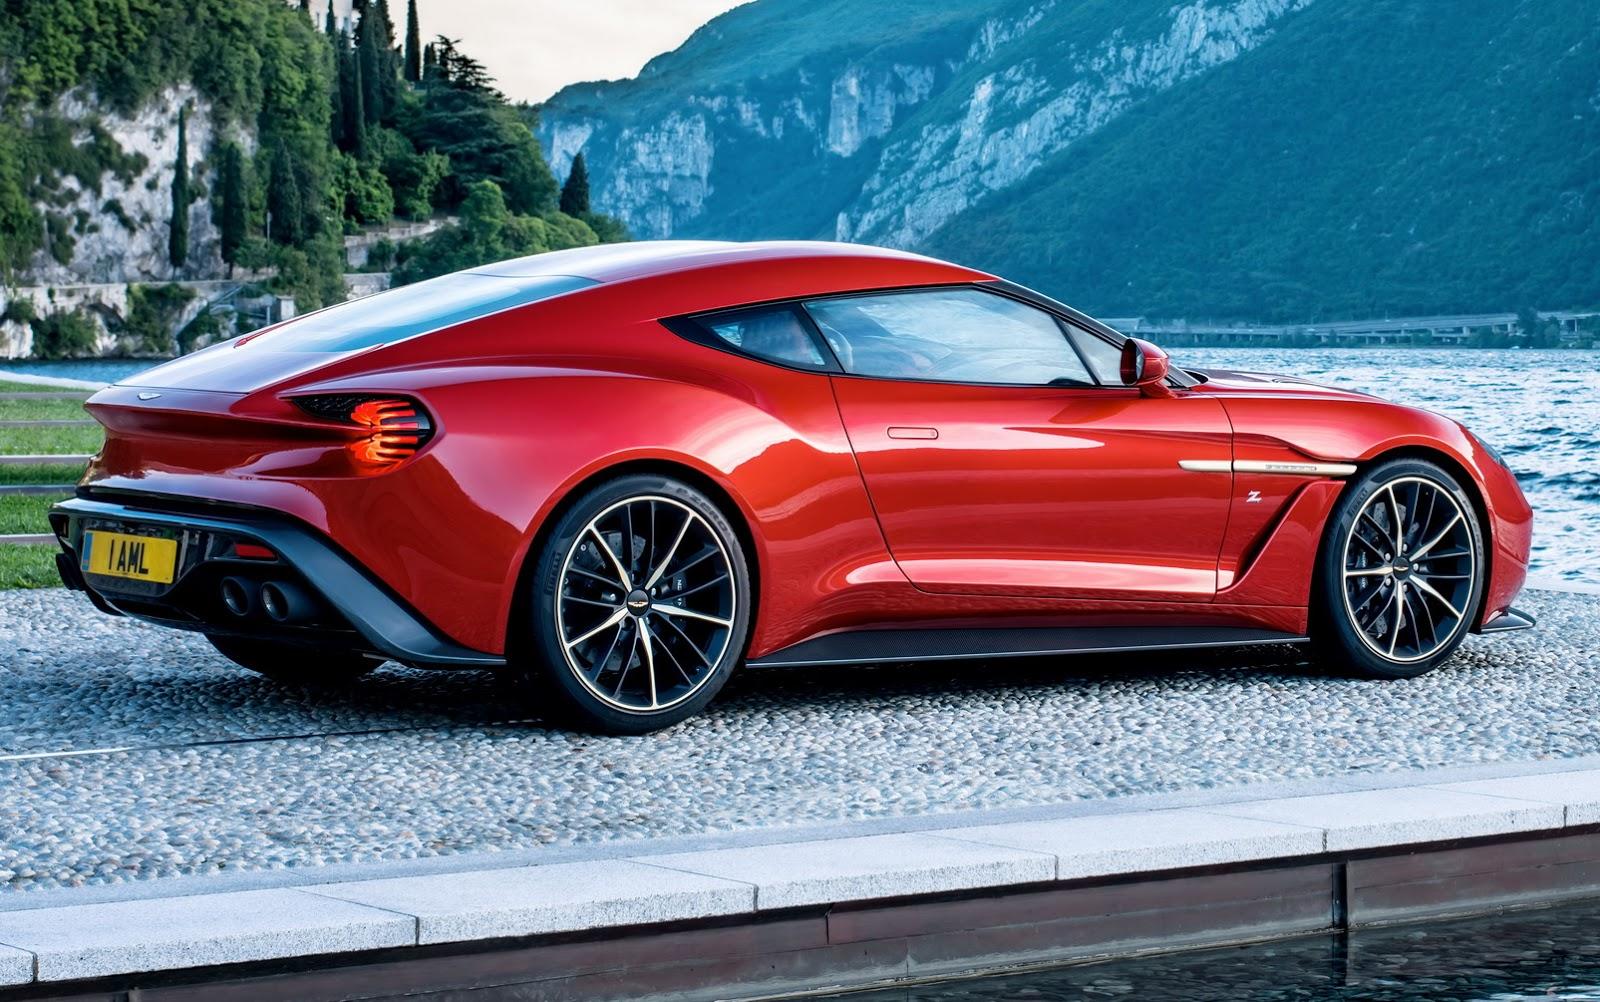 Weird Hd Wallpaper Cars Aston Martin S New Limited Production Vanquish Zagato